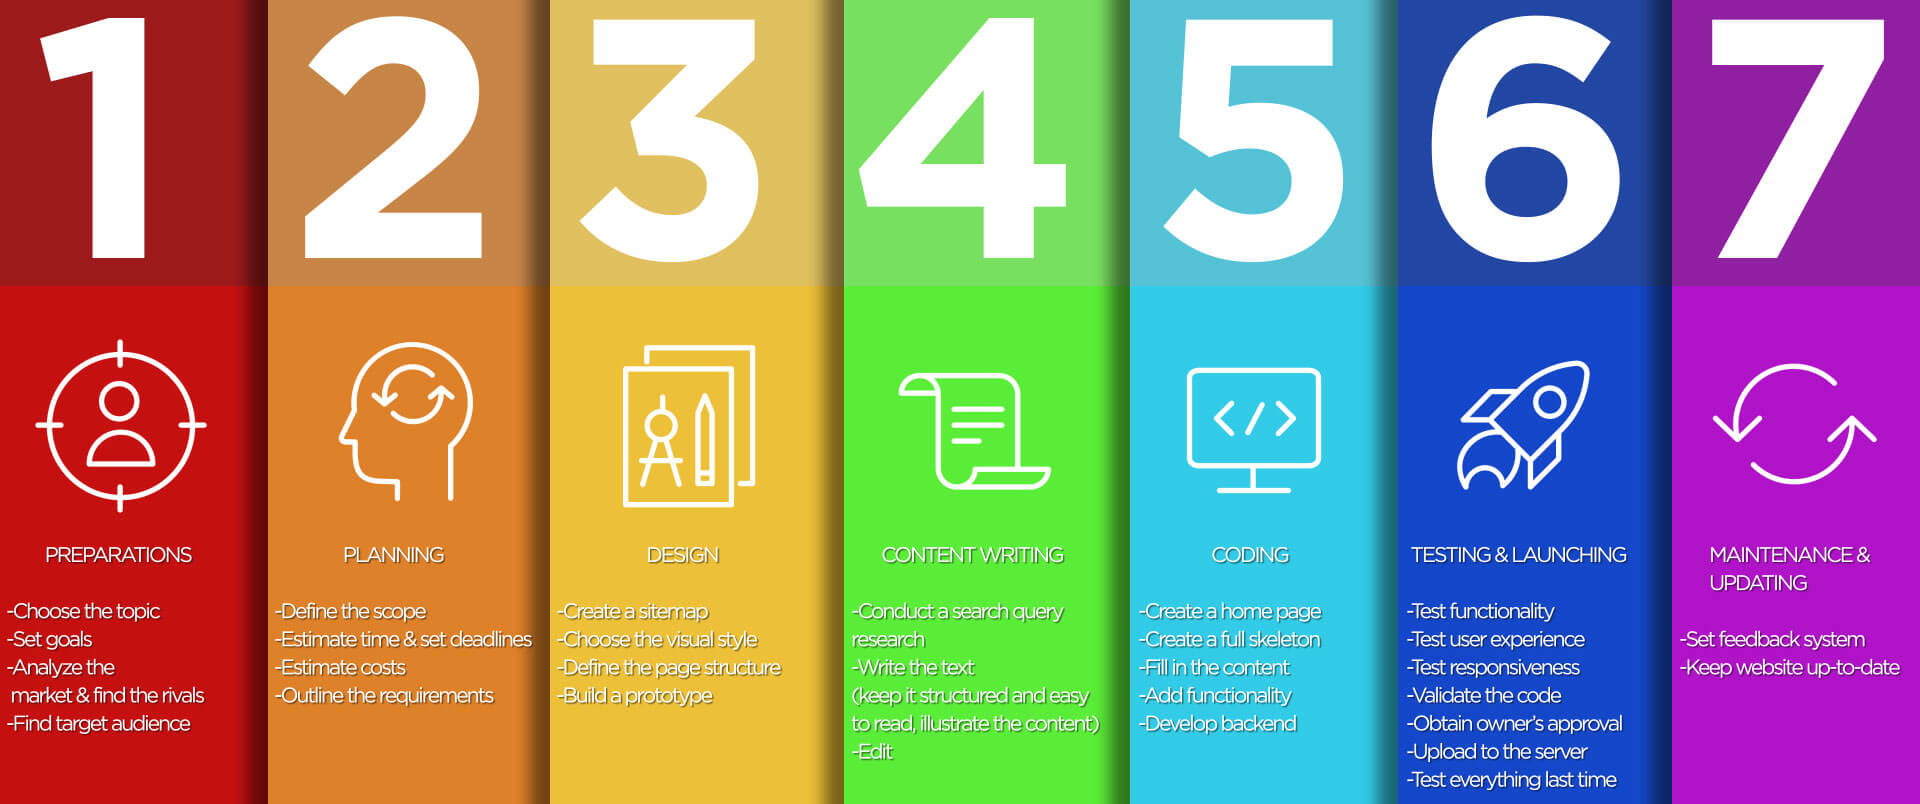 Web Portal Development Checklist